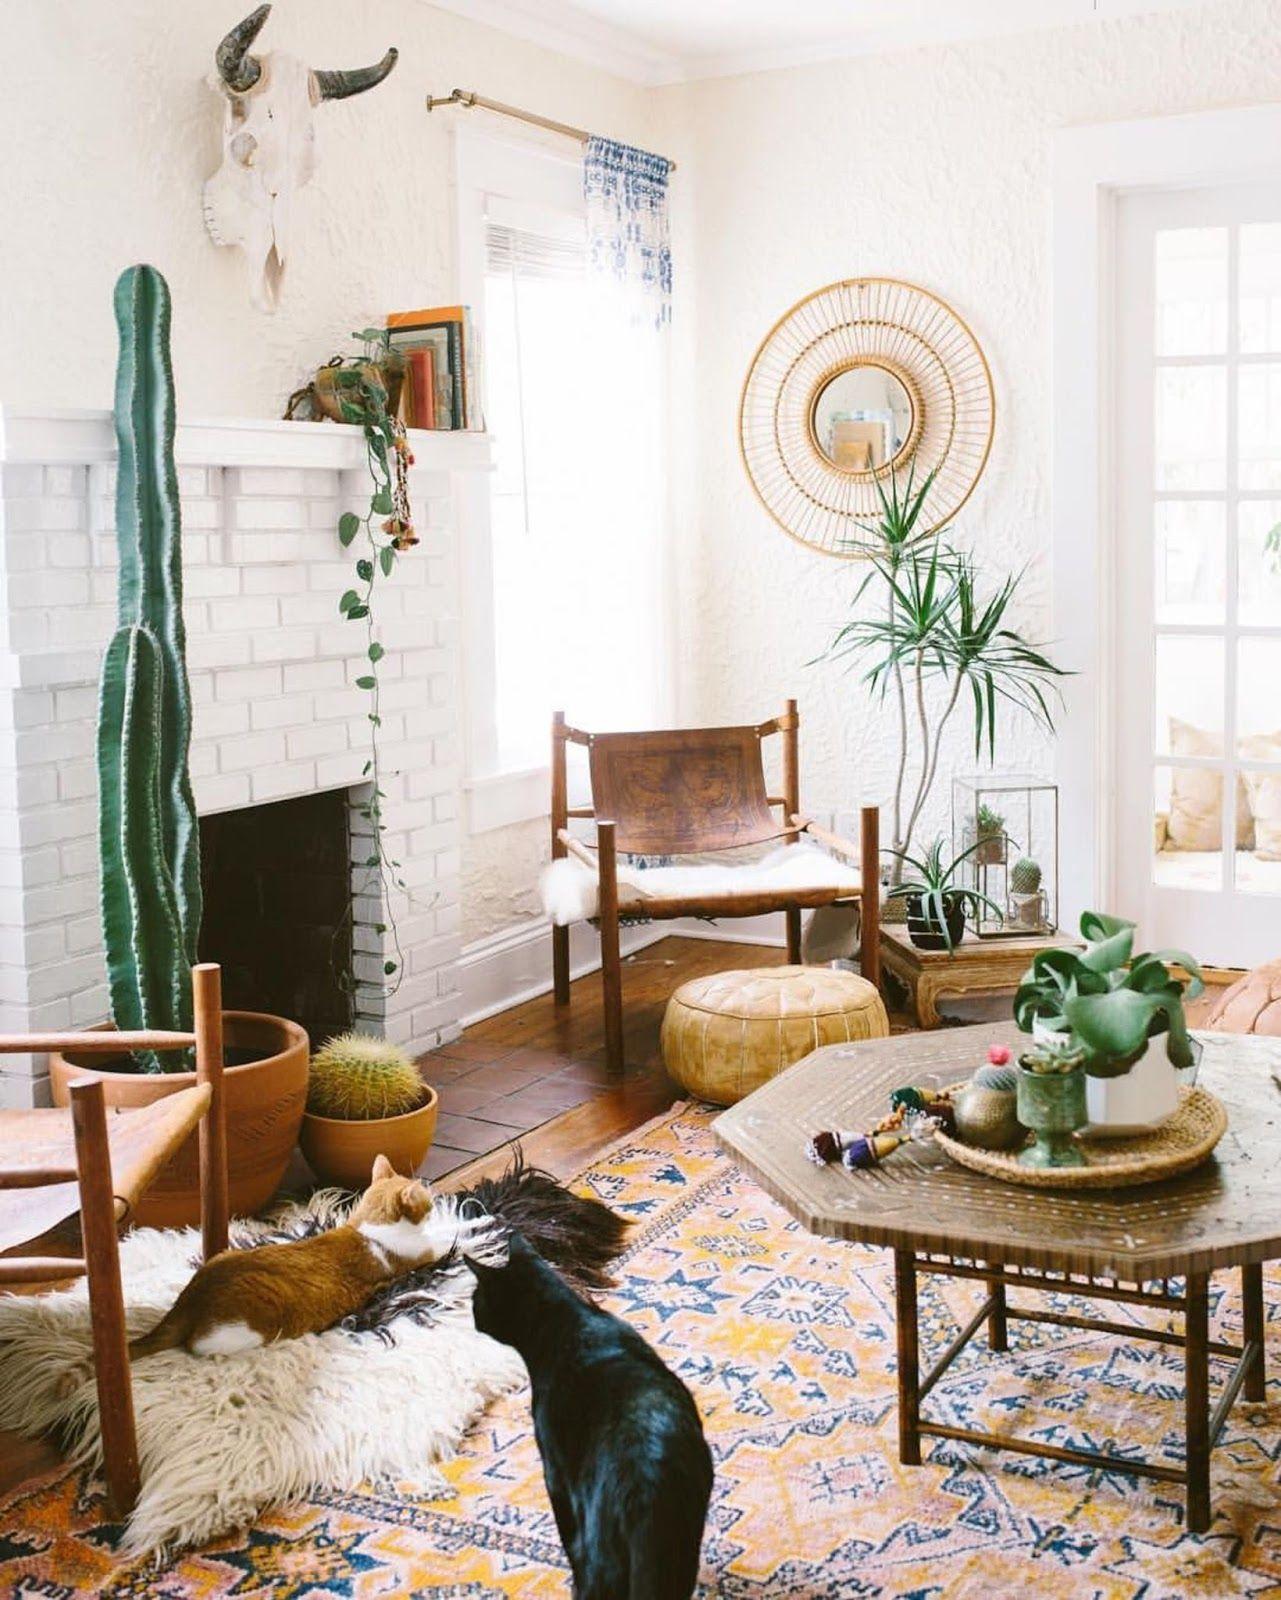 e83e546a87 10 Beautiful Boho Chic Interiors     A Roundup by Design Fixation